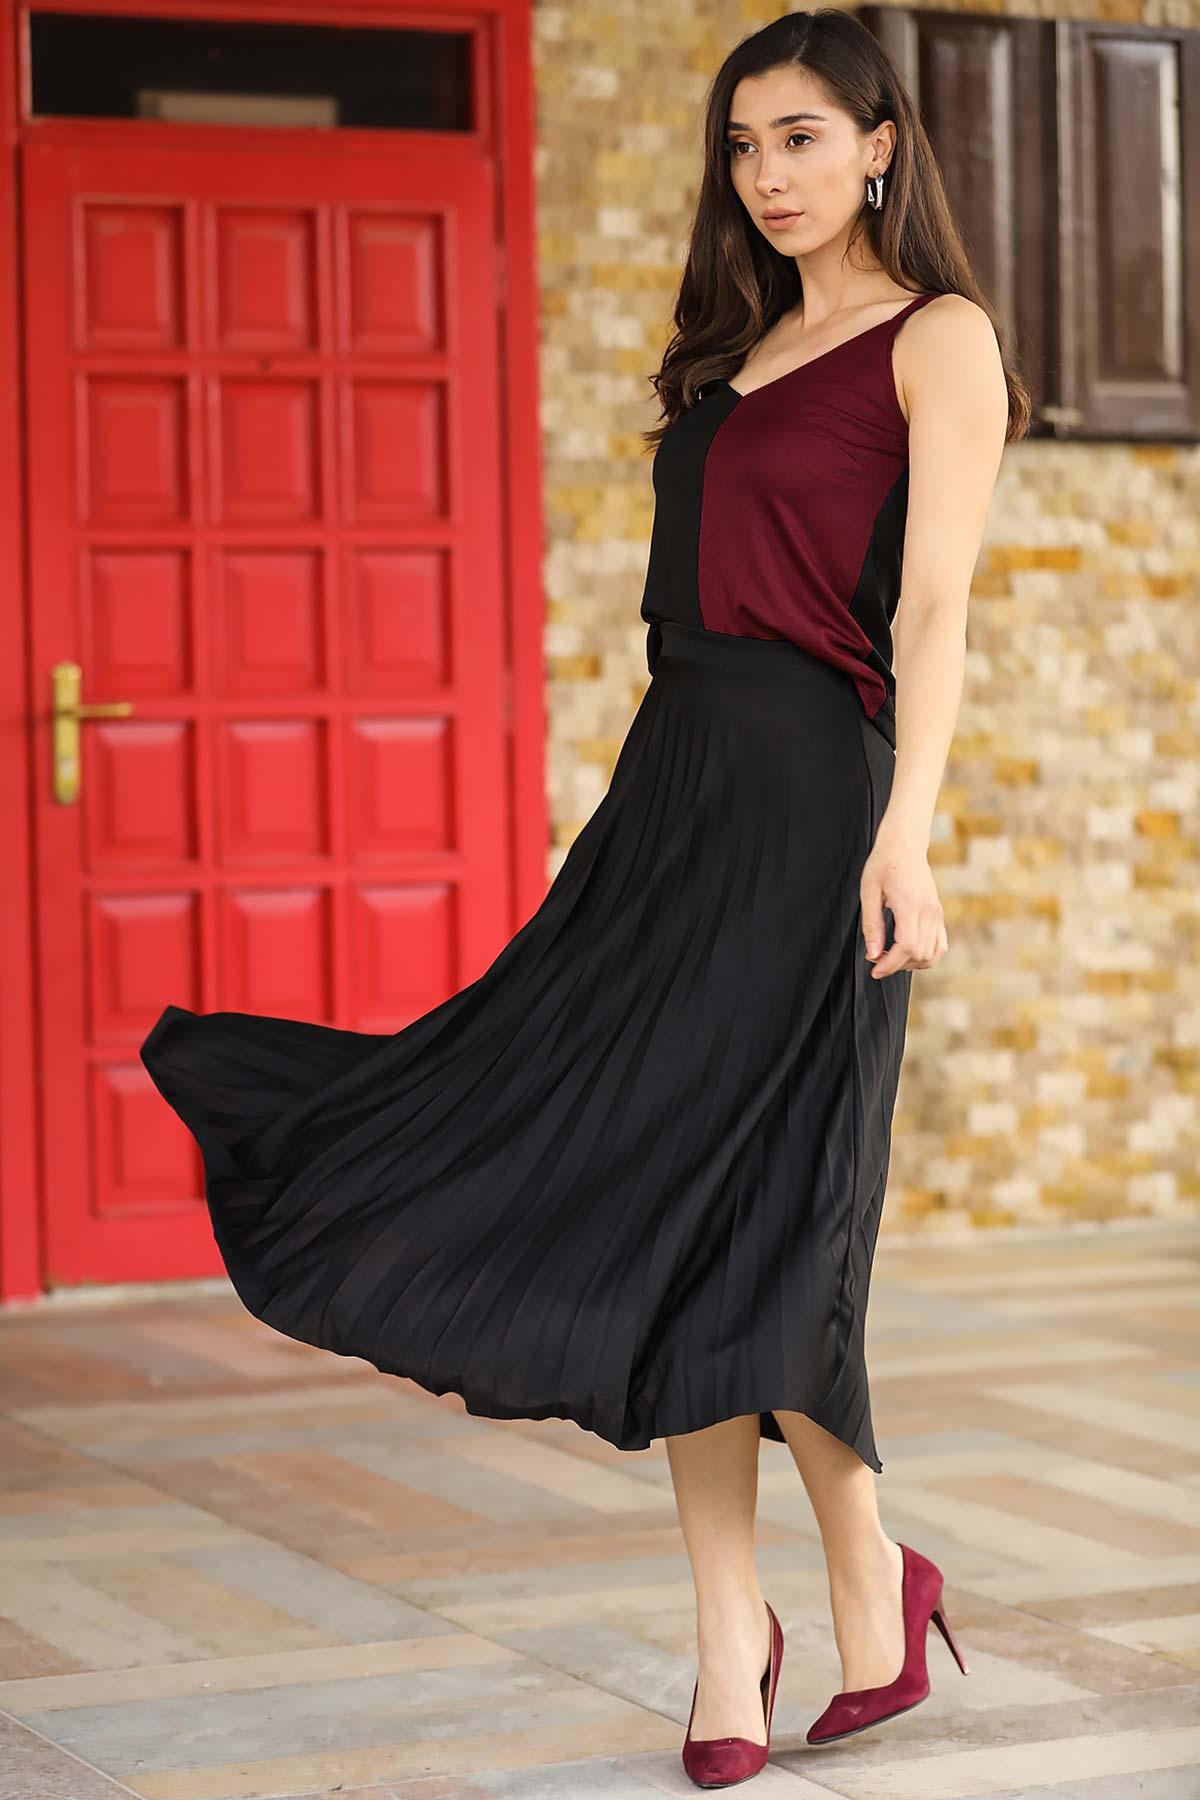 Women's Black T-shirt Skirt Set